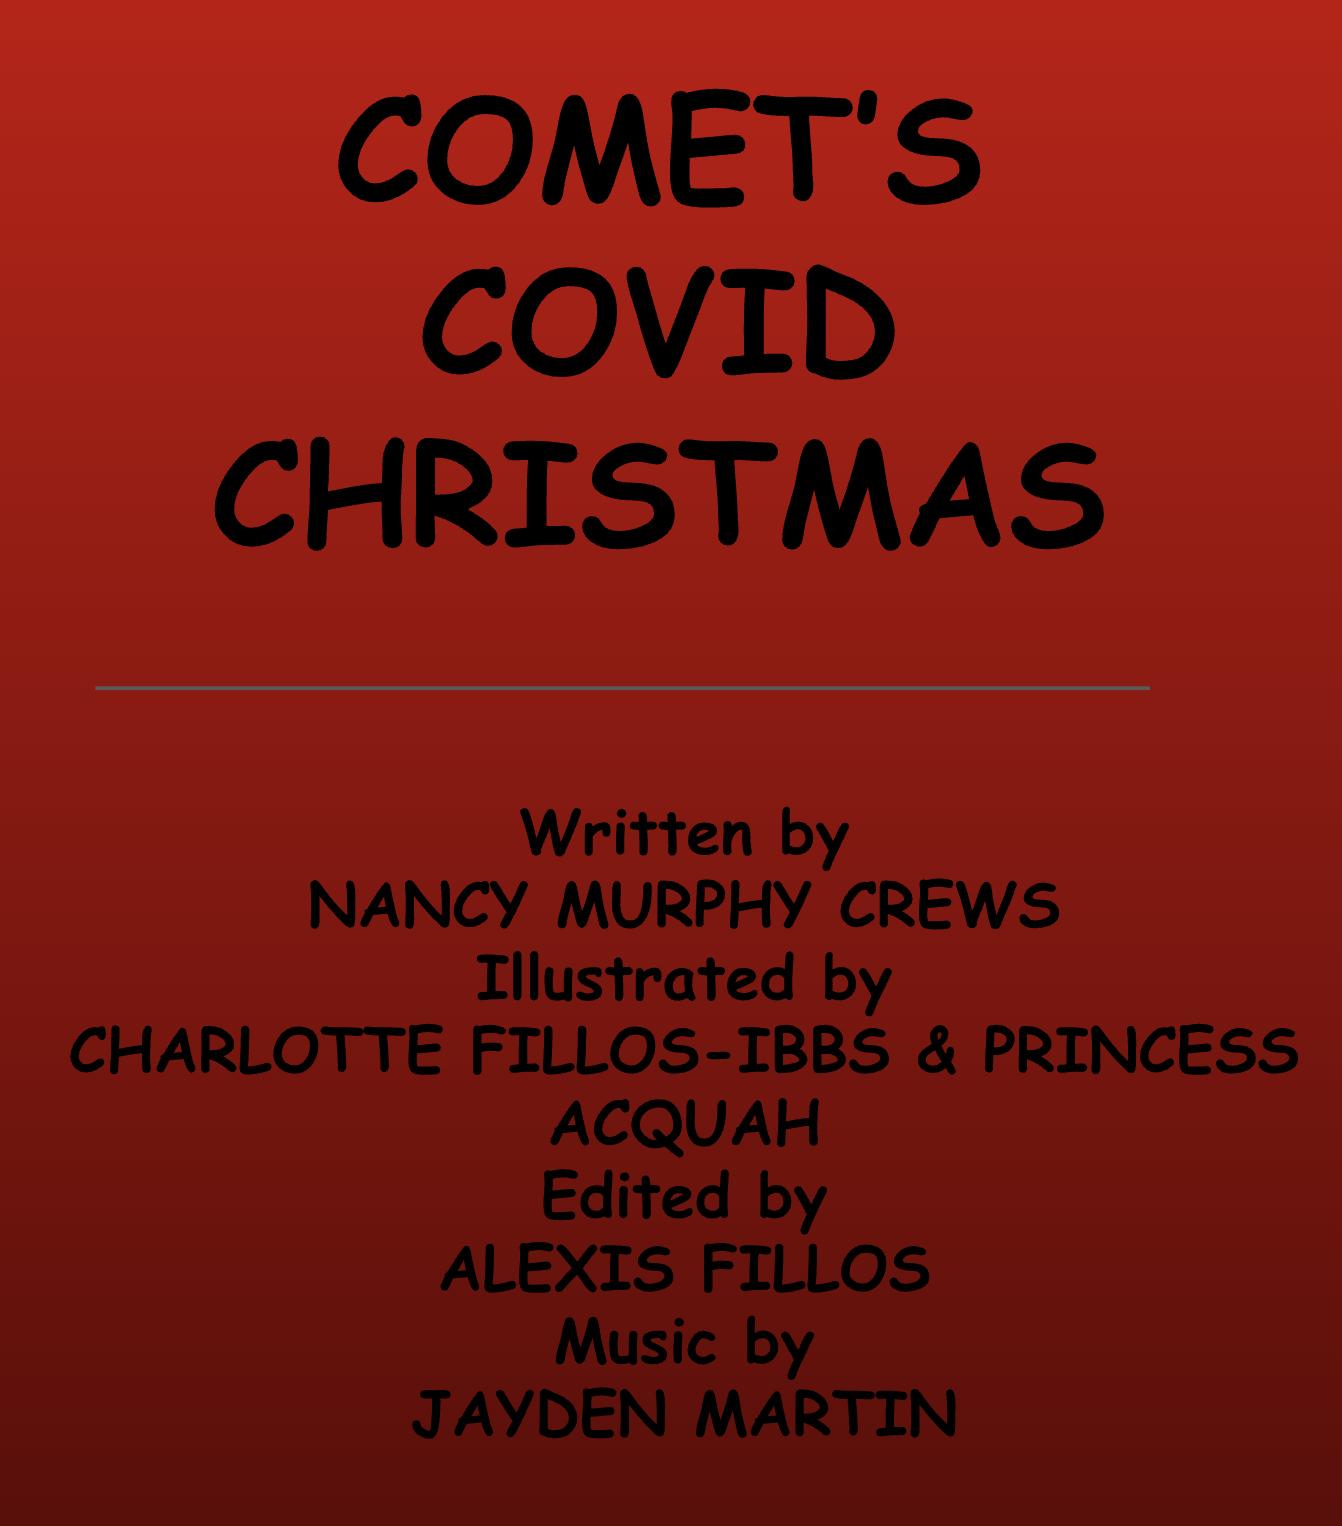 Comet's COVID Christmas